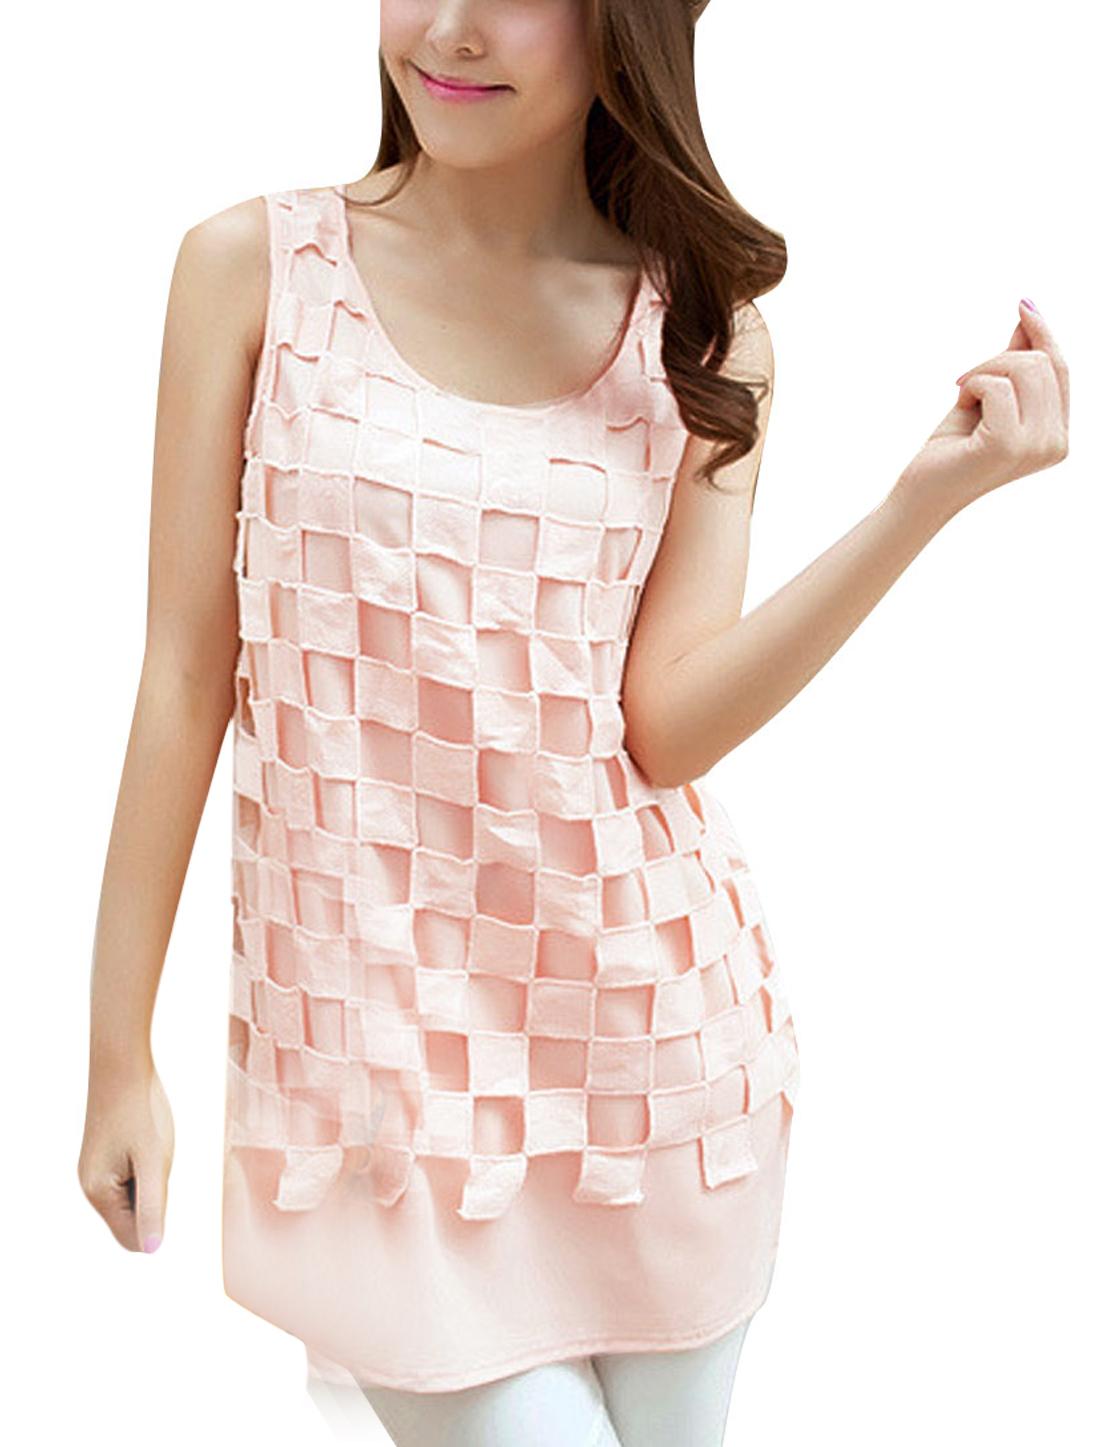 Ladies Round Neck Sleeveless Semi Sheer Top Shirt Pink XS